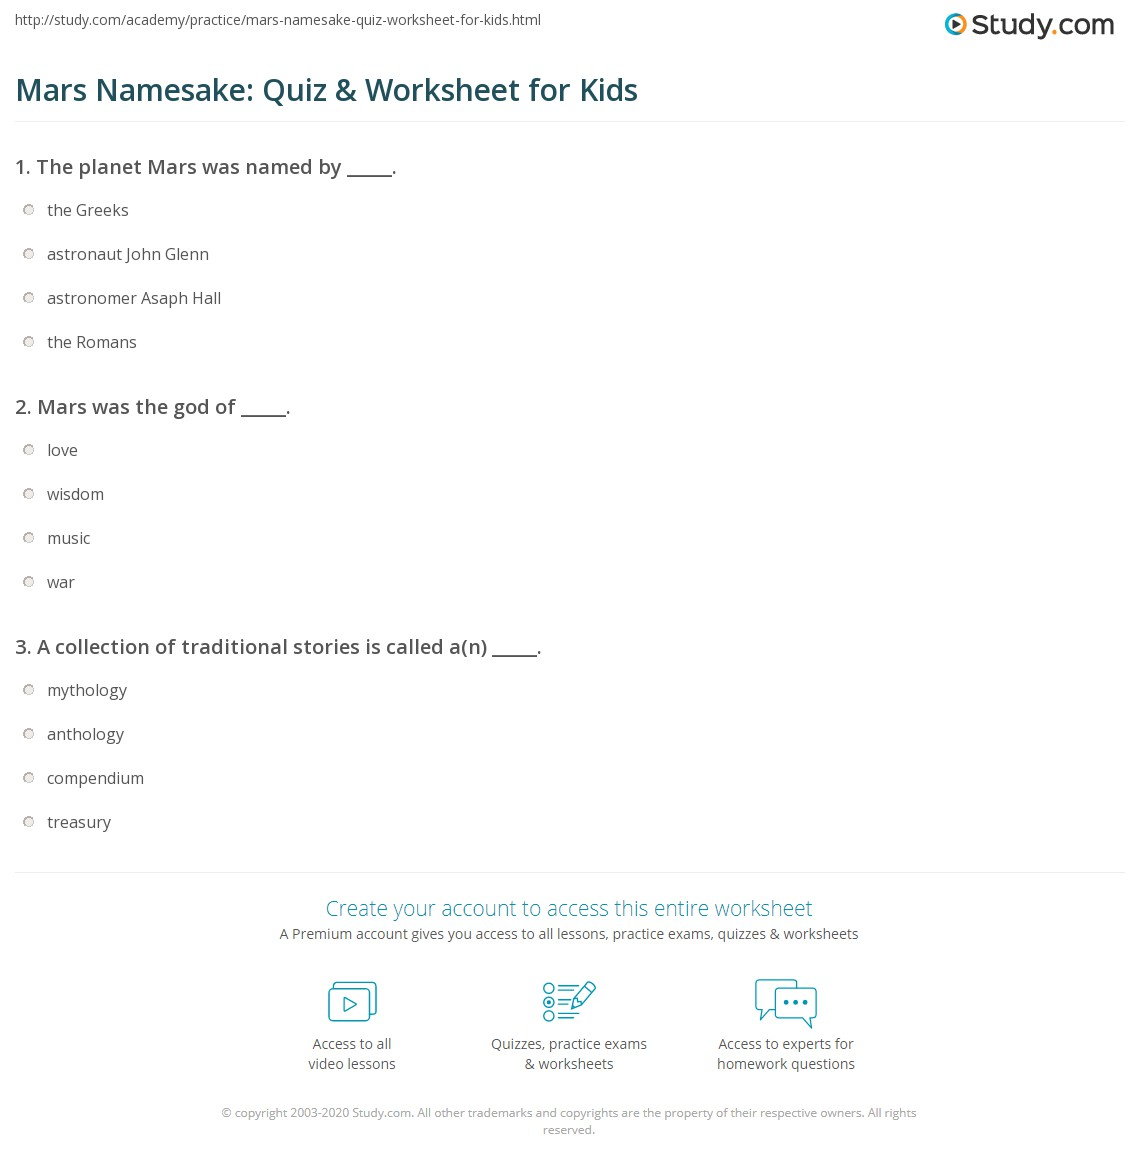 Mars Namesake Quiz Amp Worksheet For Kids